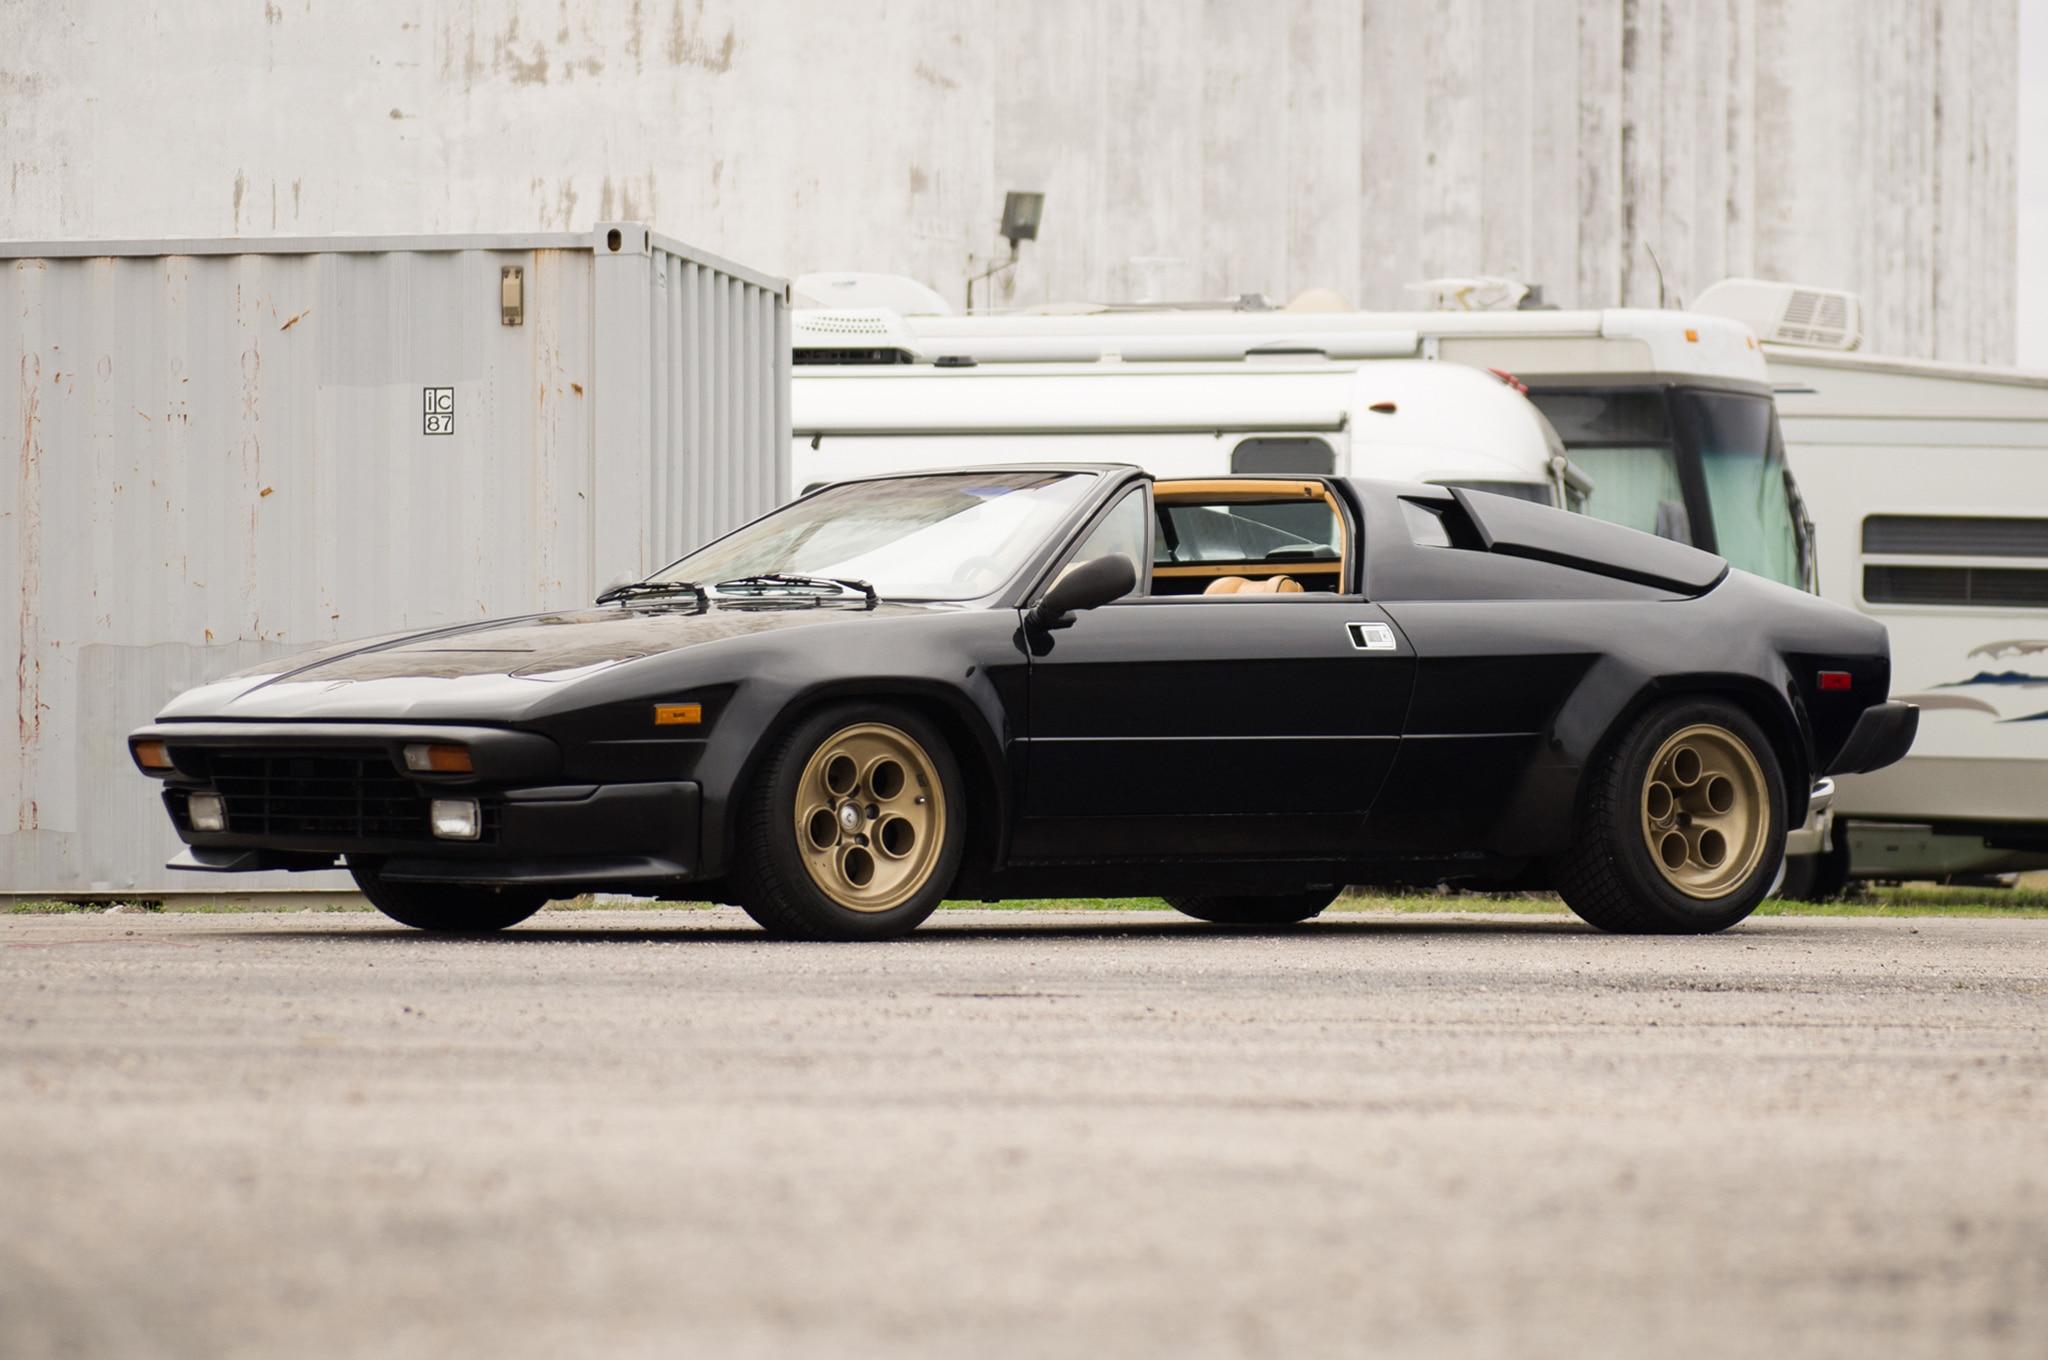 1988 Lamborghini Jalpa Just Listed Front Three Quarters